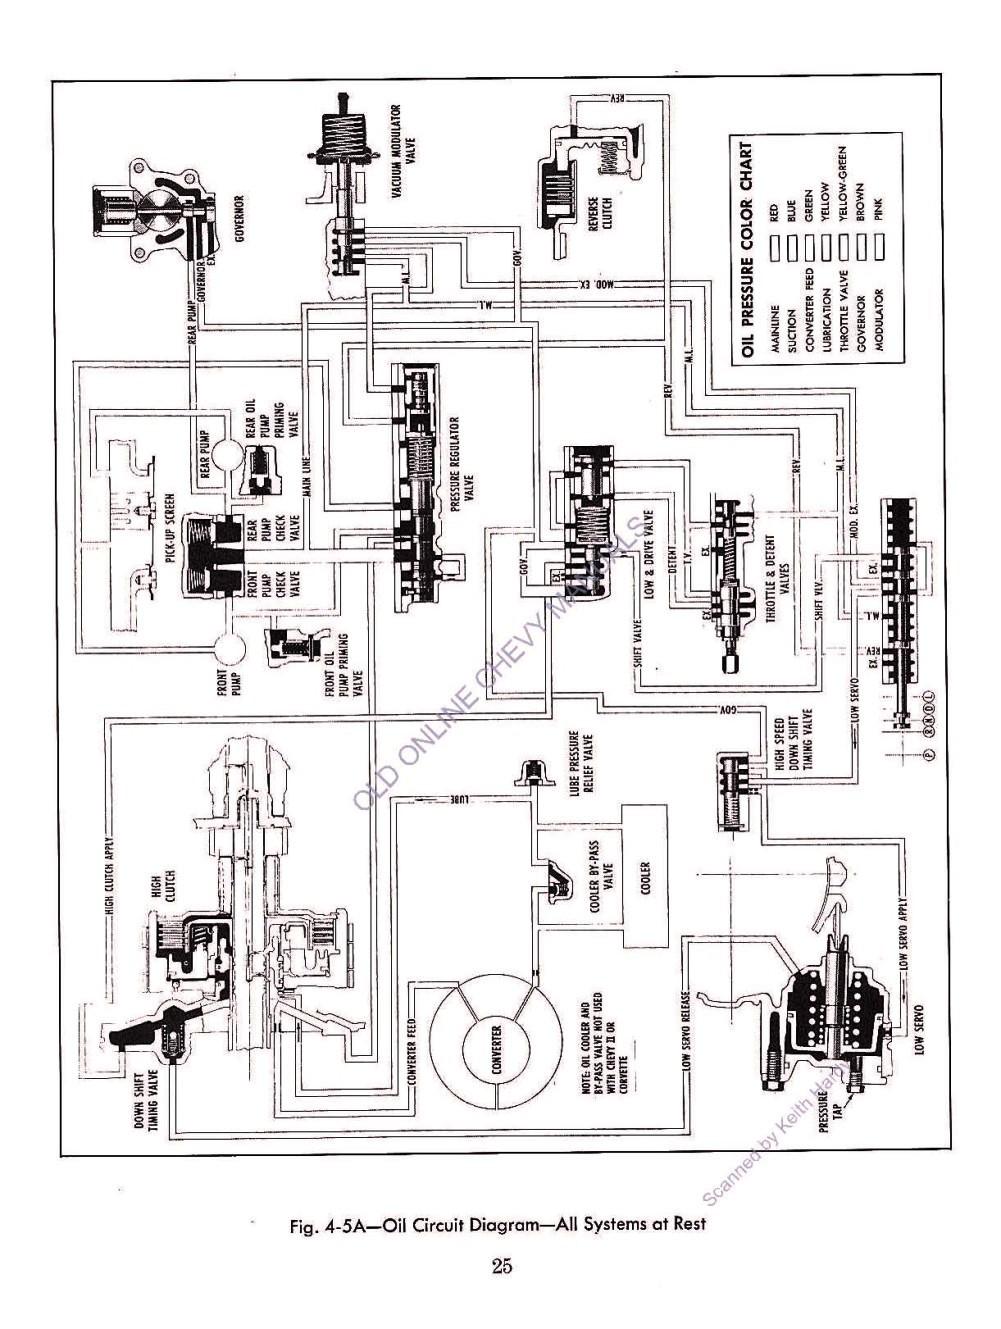 1962 Chevrolet ALUMINUM-CASE POWERGLIDE Training Program